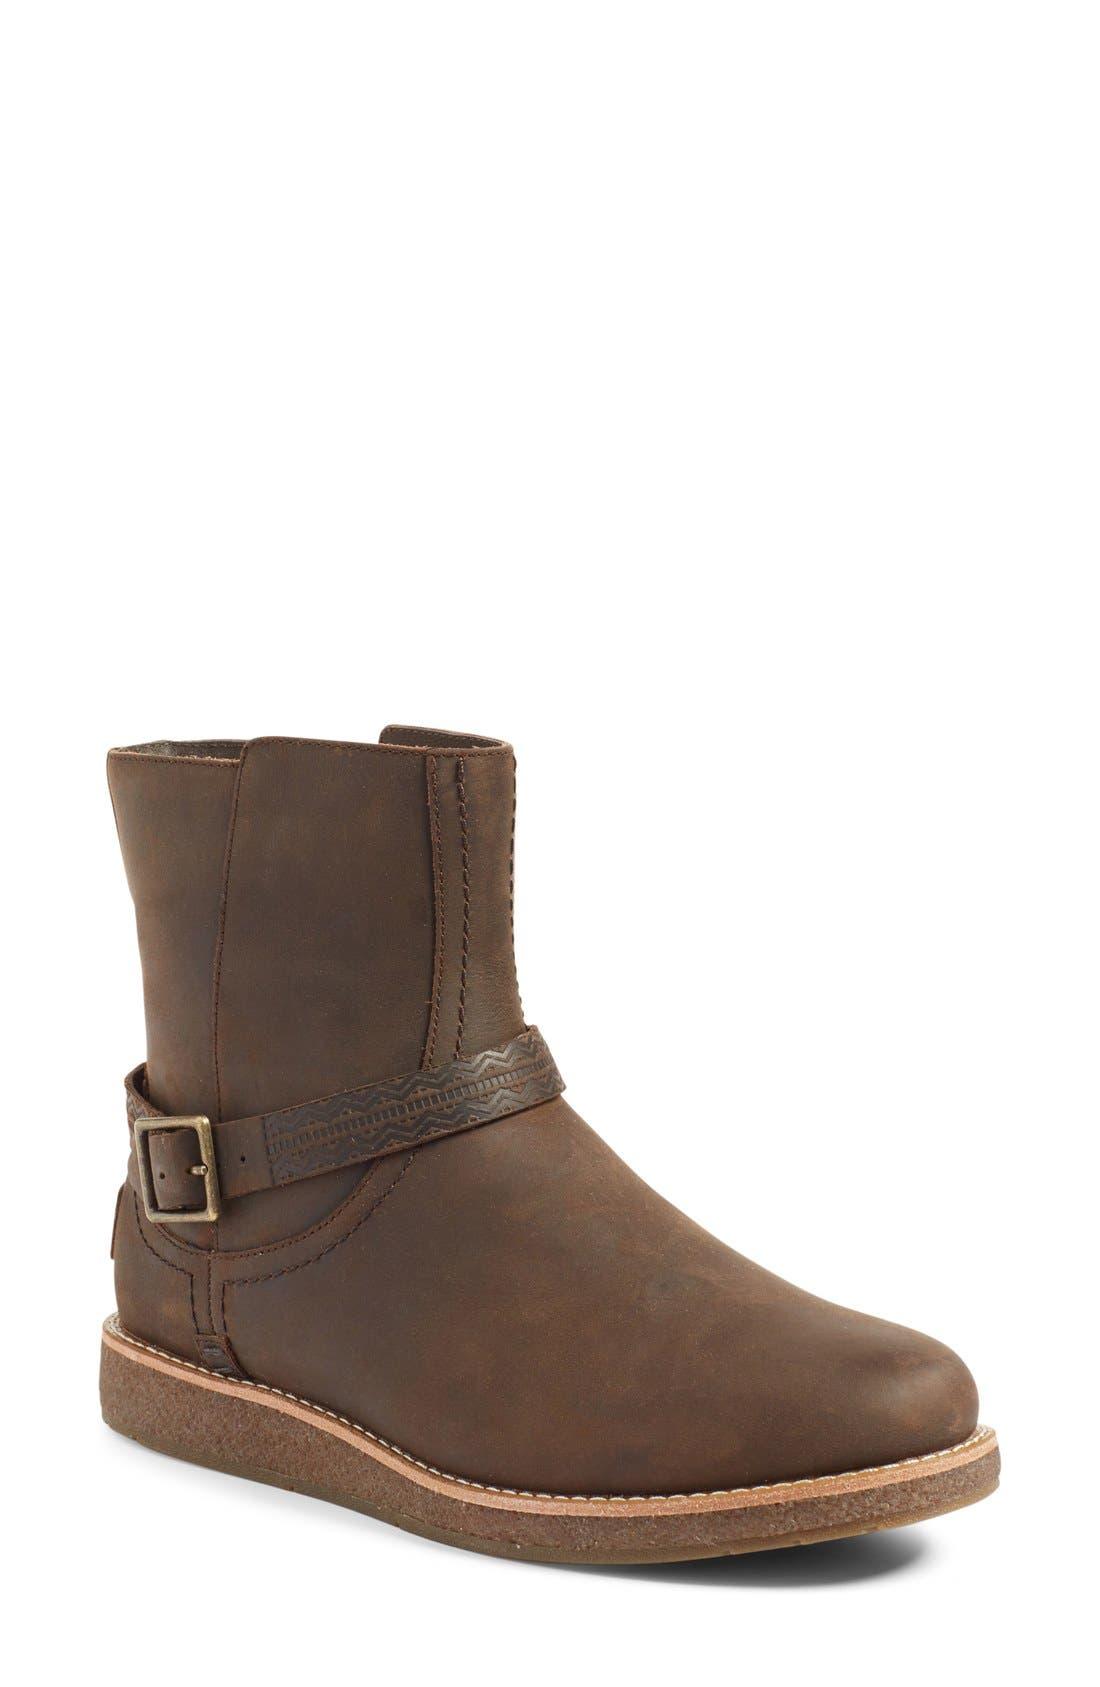 Main Image - UGG® 'Camren' Boot (Women)